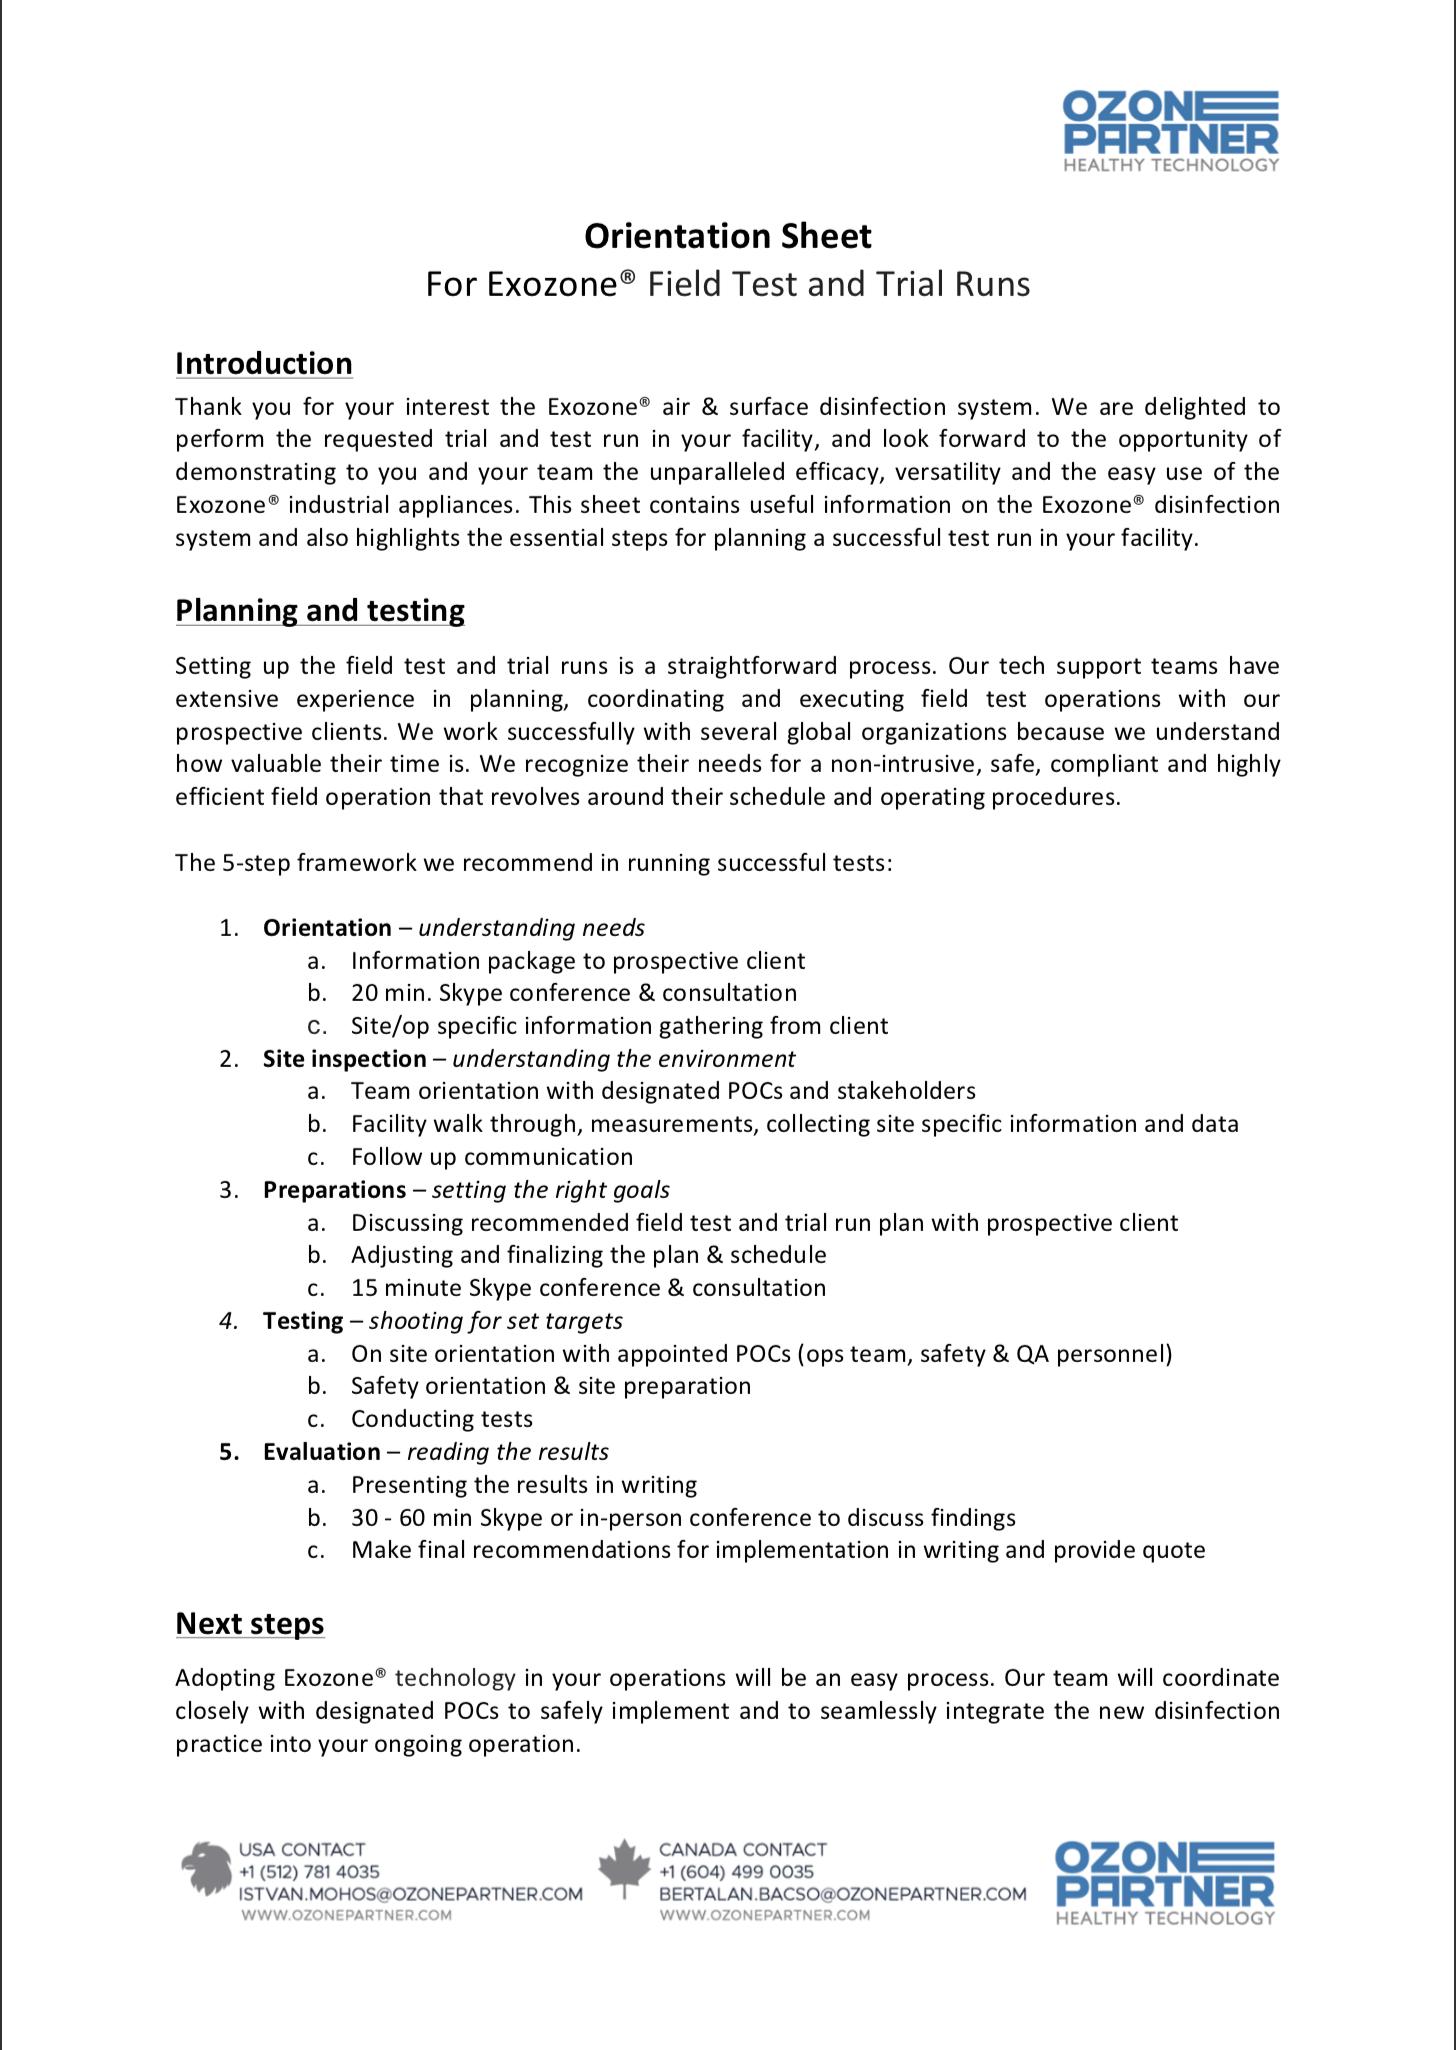 Download Orientation Sheet